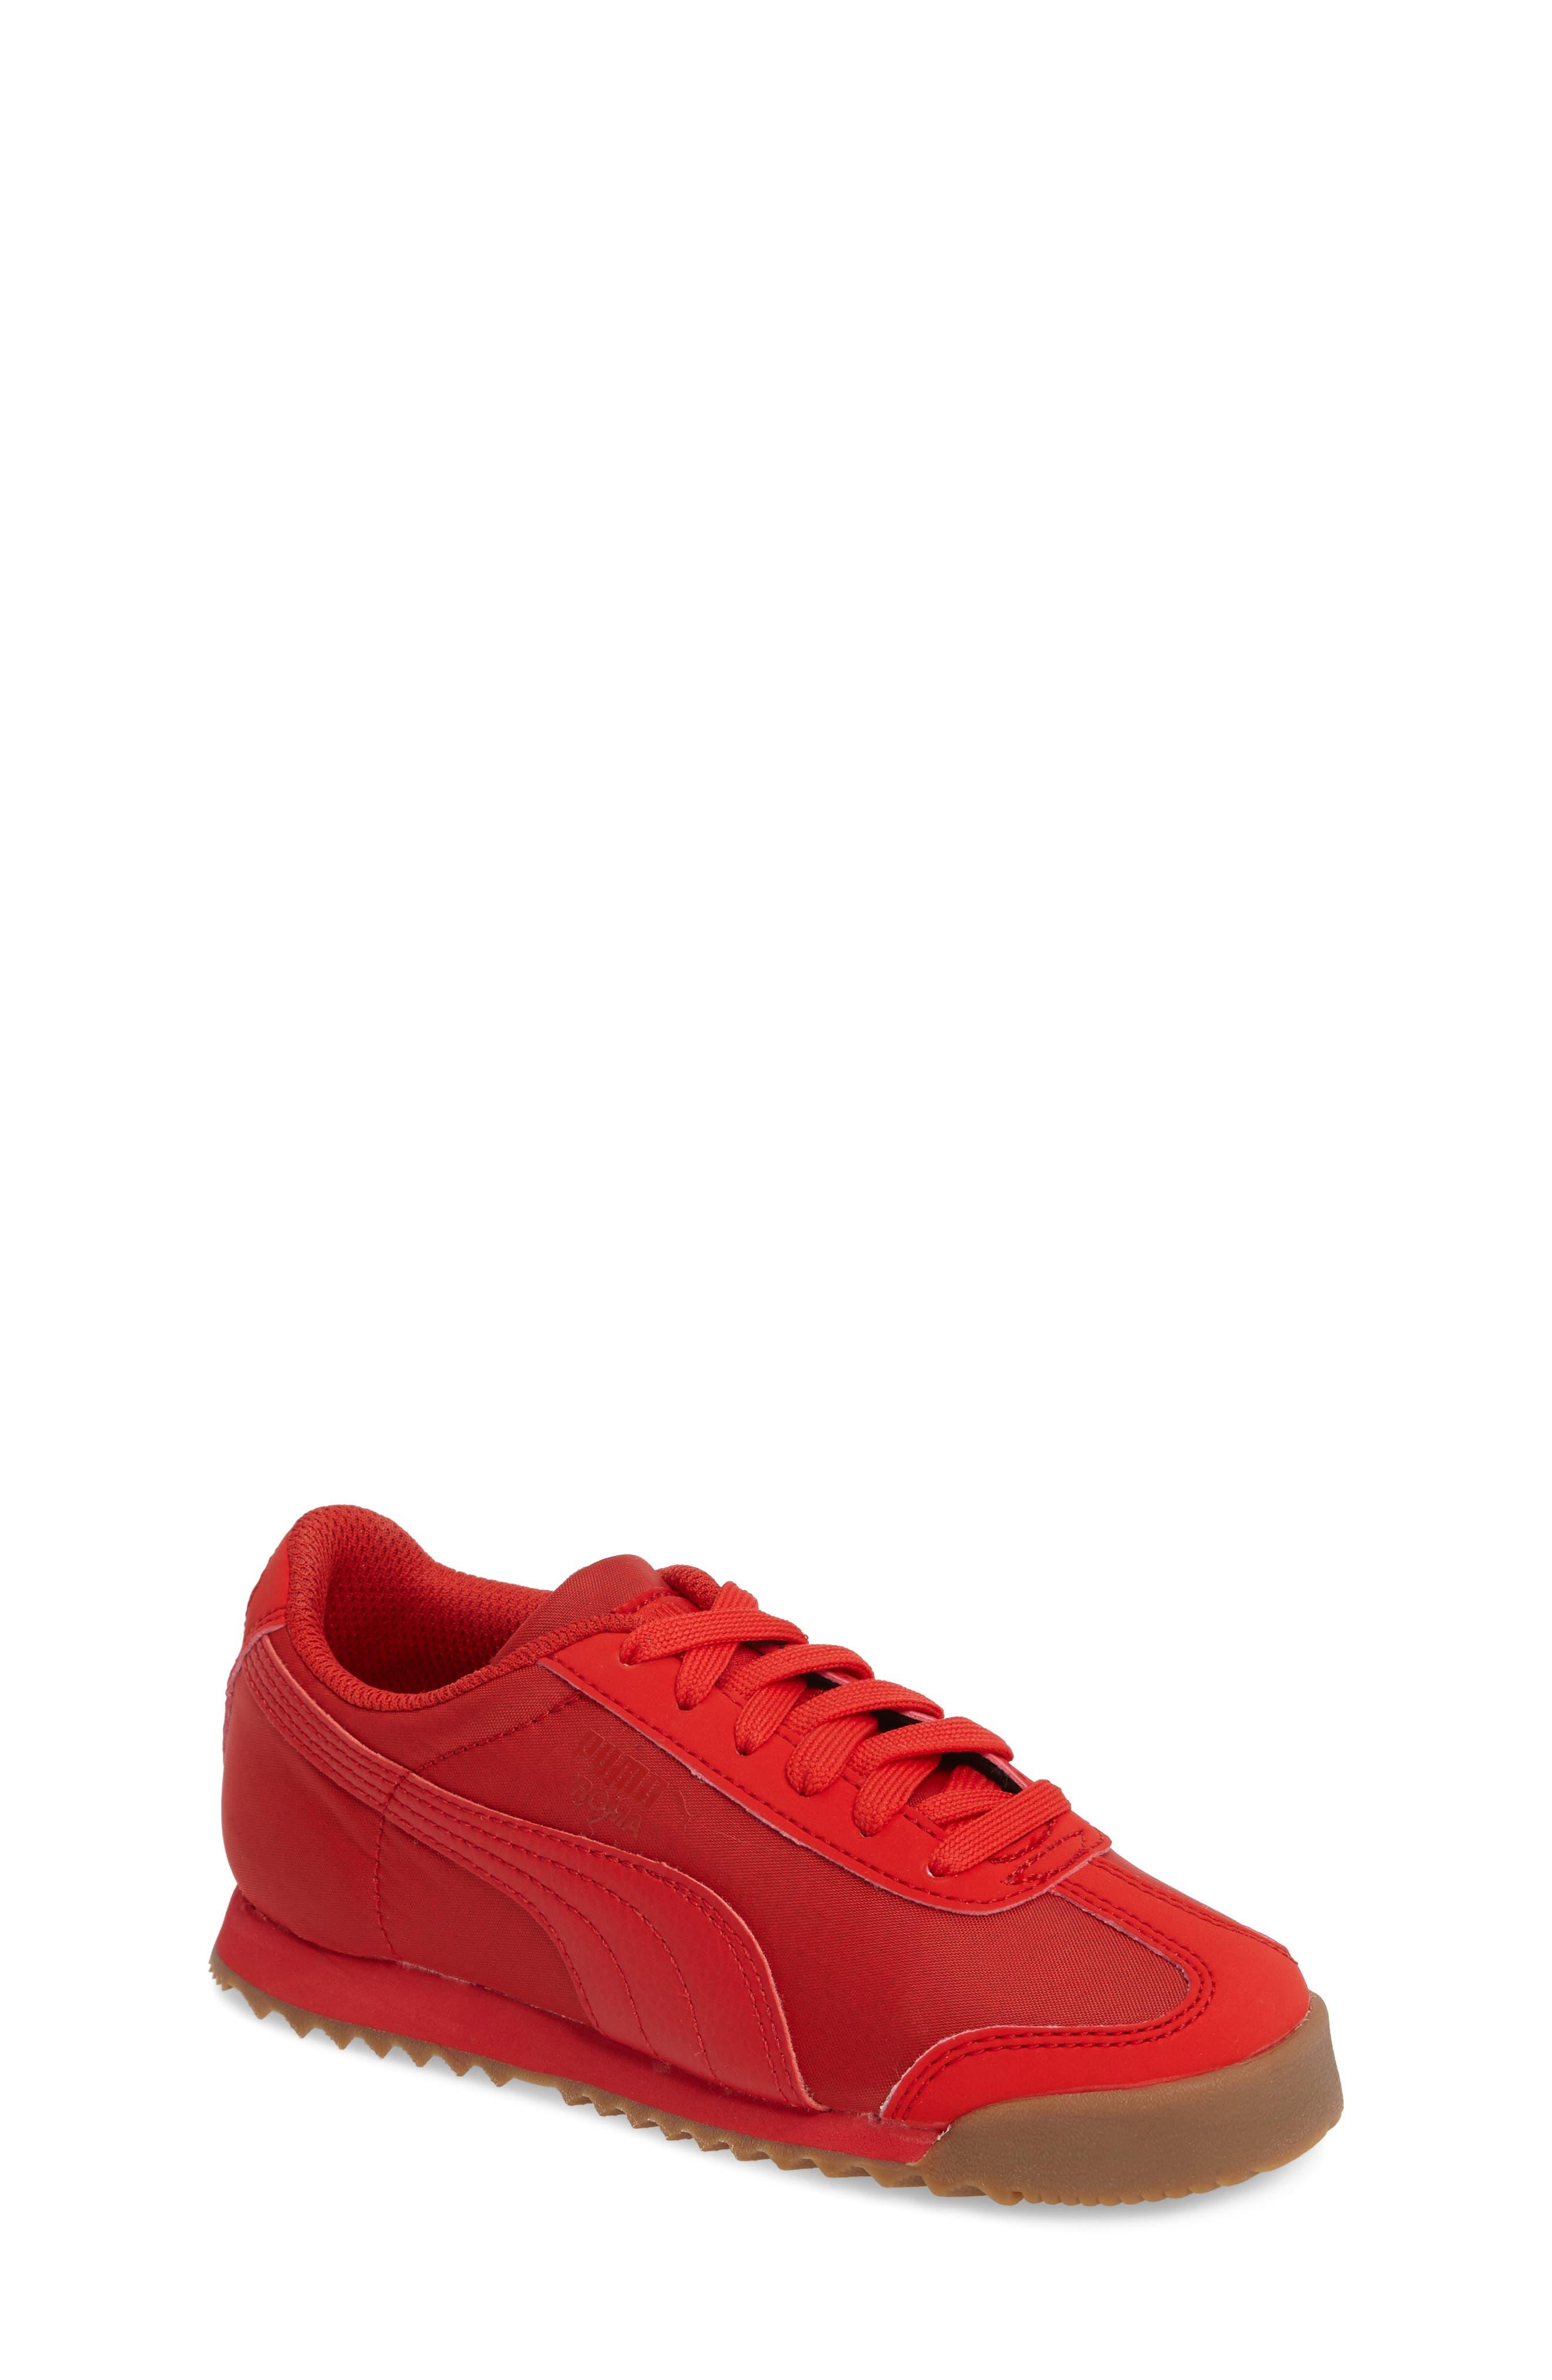 Alternate Image 1 Selected - Puma Roma Basic Summer Sneaker (Toddler, Little Kid & Big Kid)